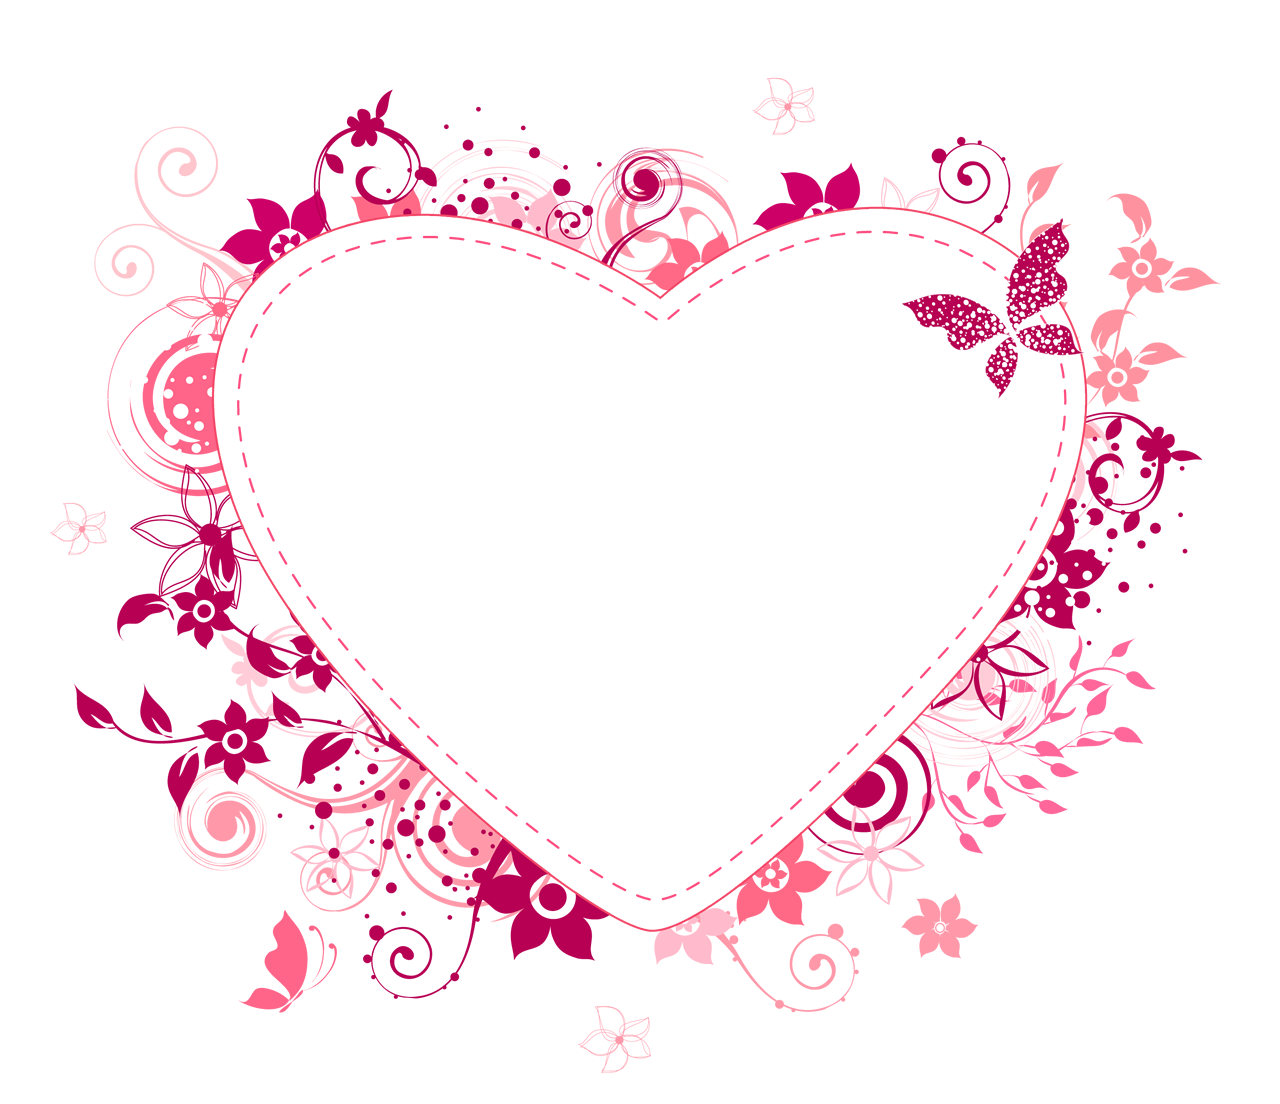 Cora o com flores. Heat clipart colorful heart